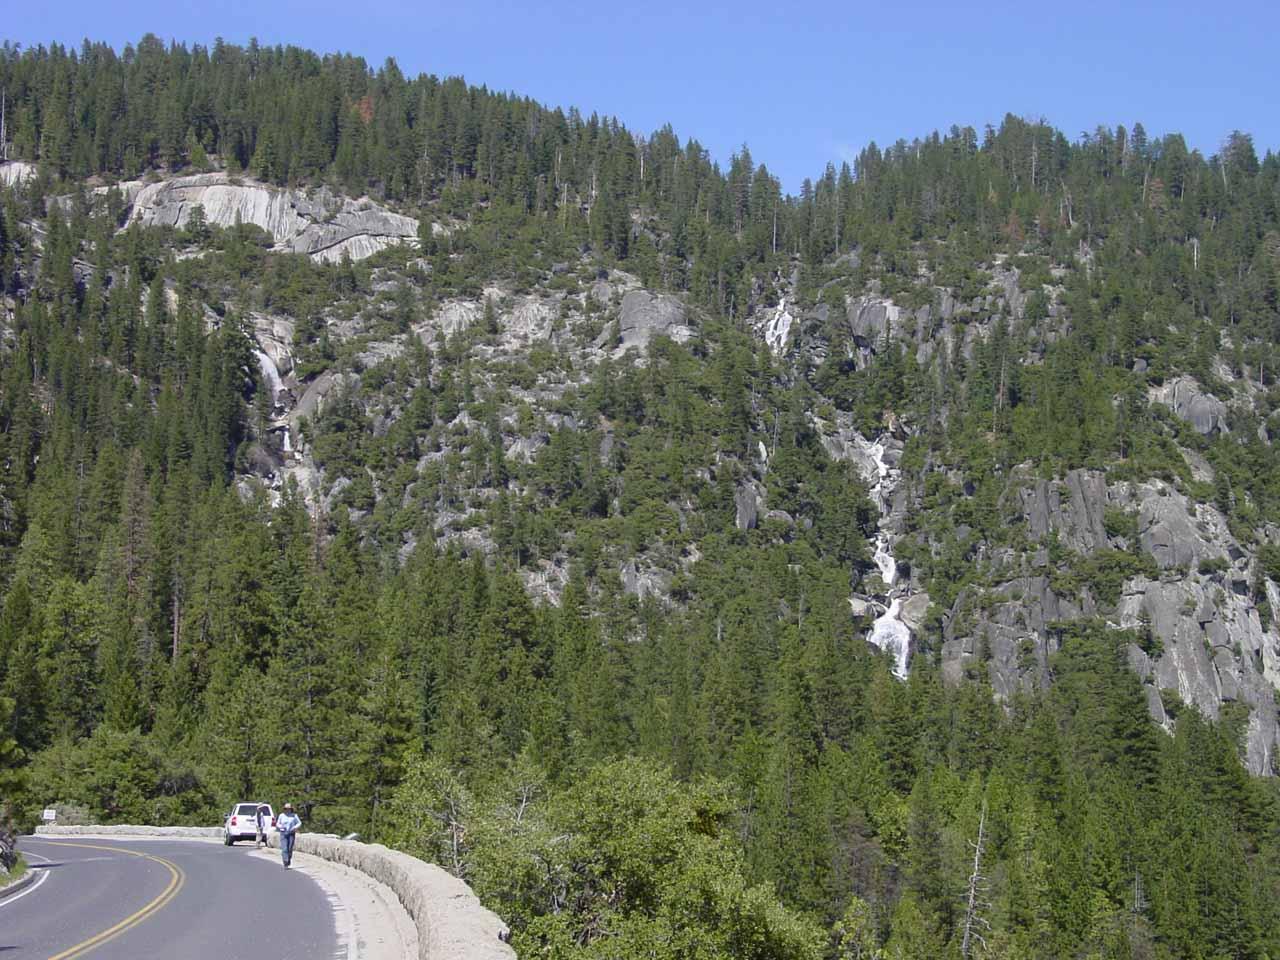 The Upper Cascades from the Big Oak Flat Road